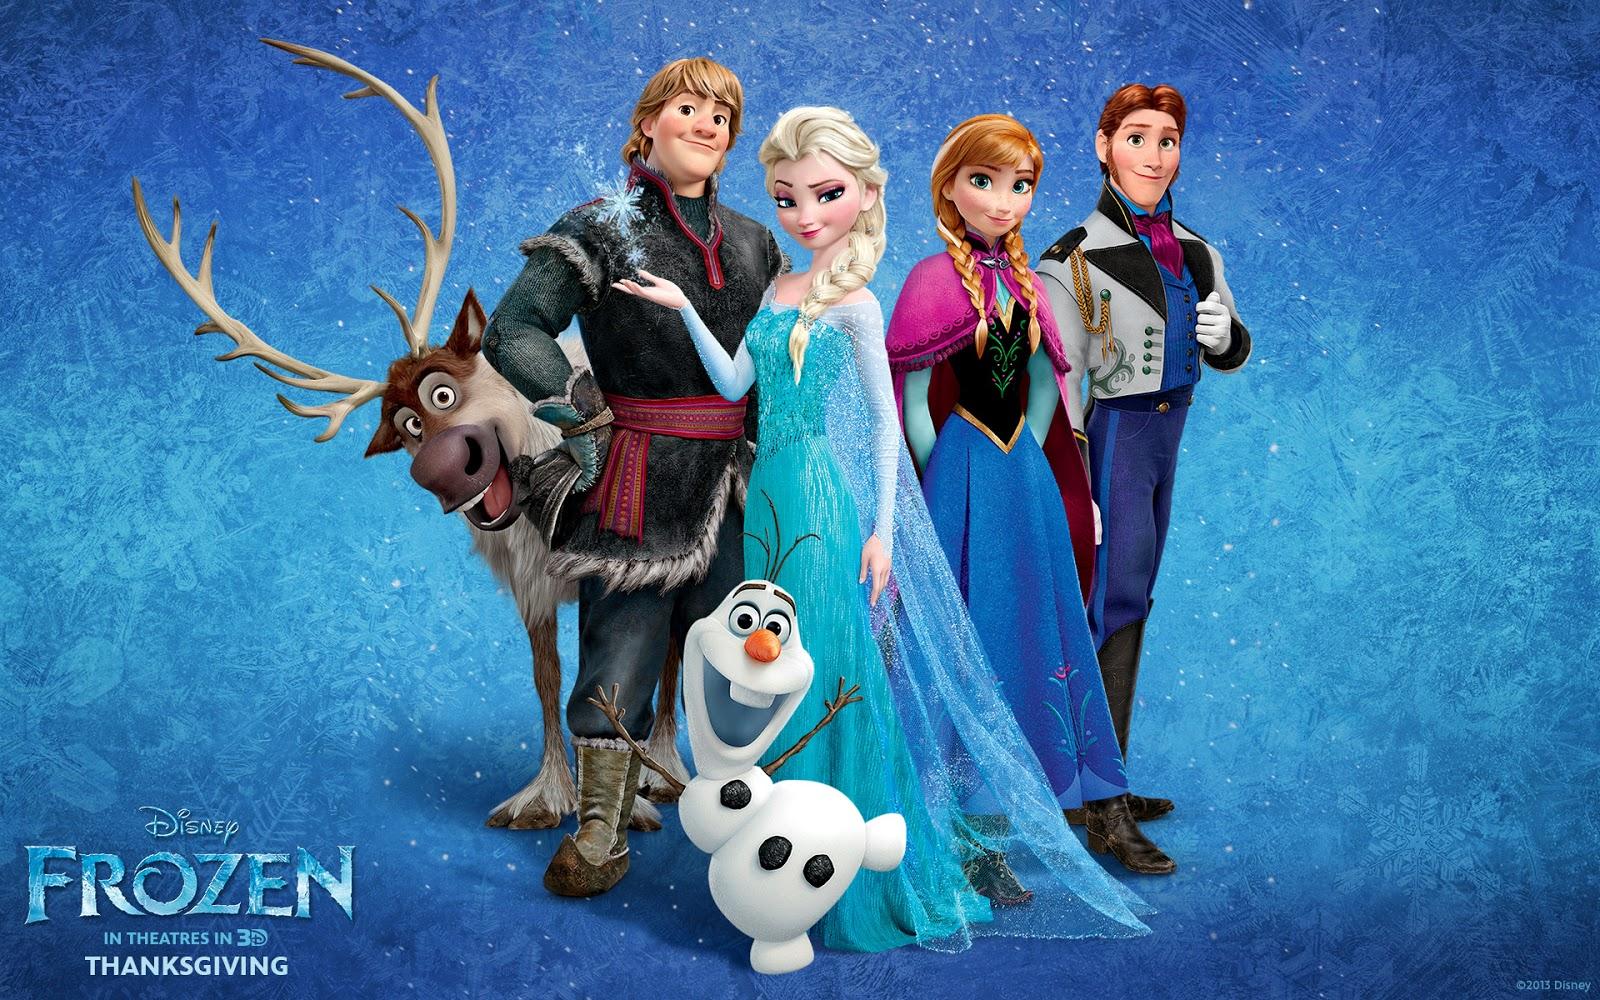 Disney Frozen Movie Characters HD Wallpaper